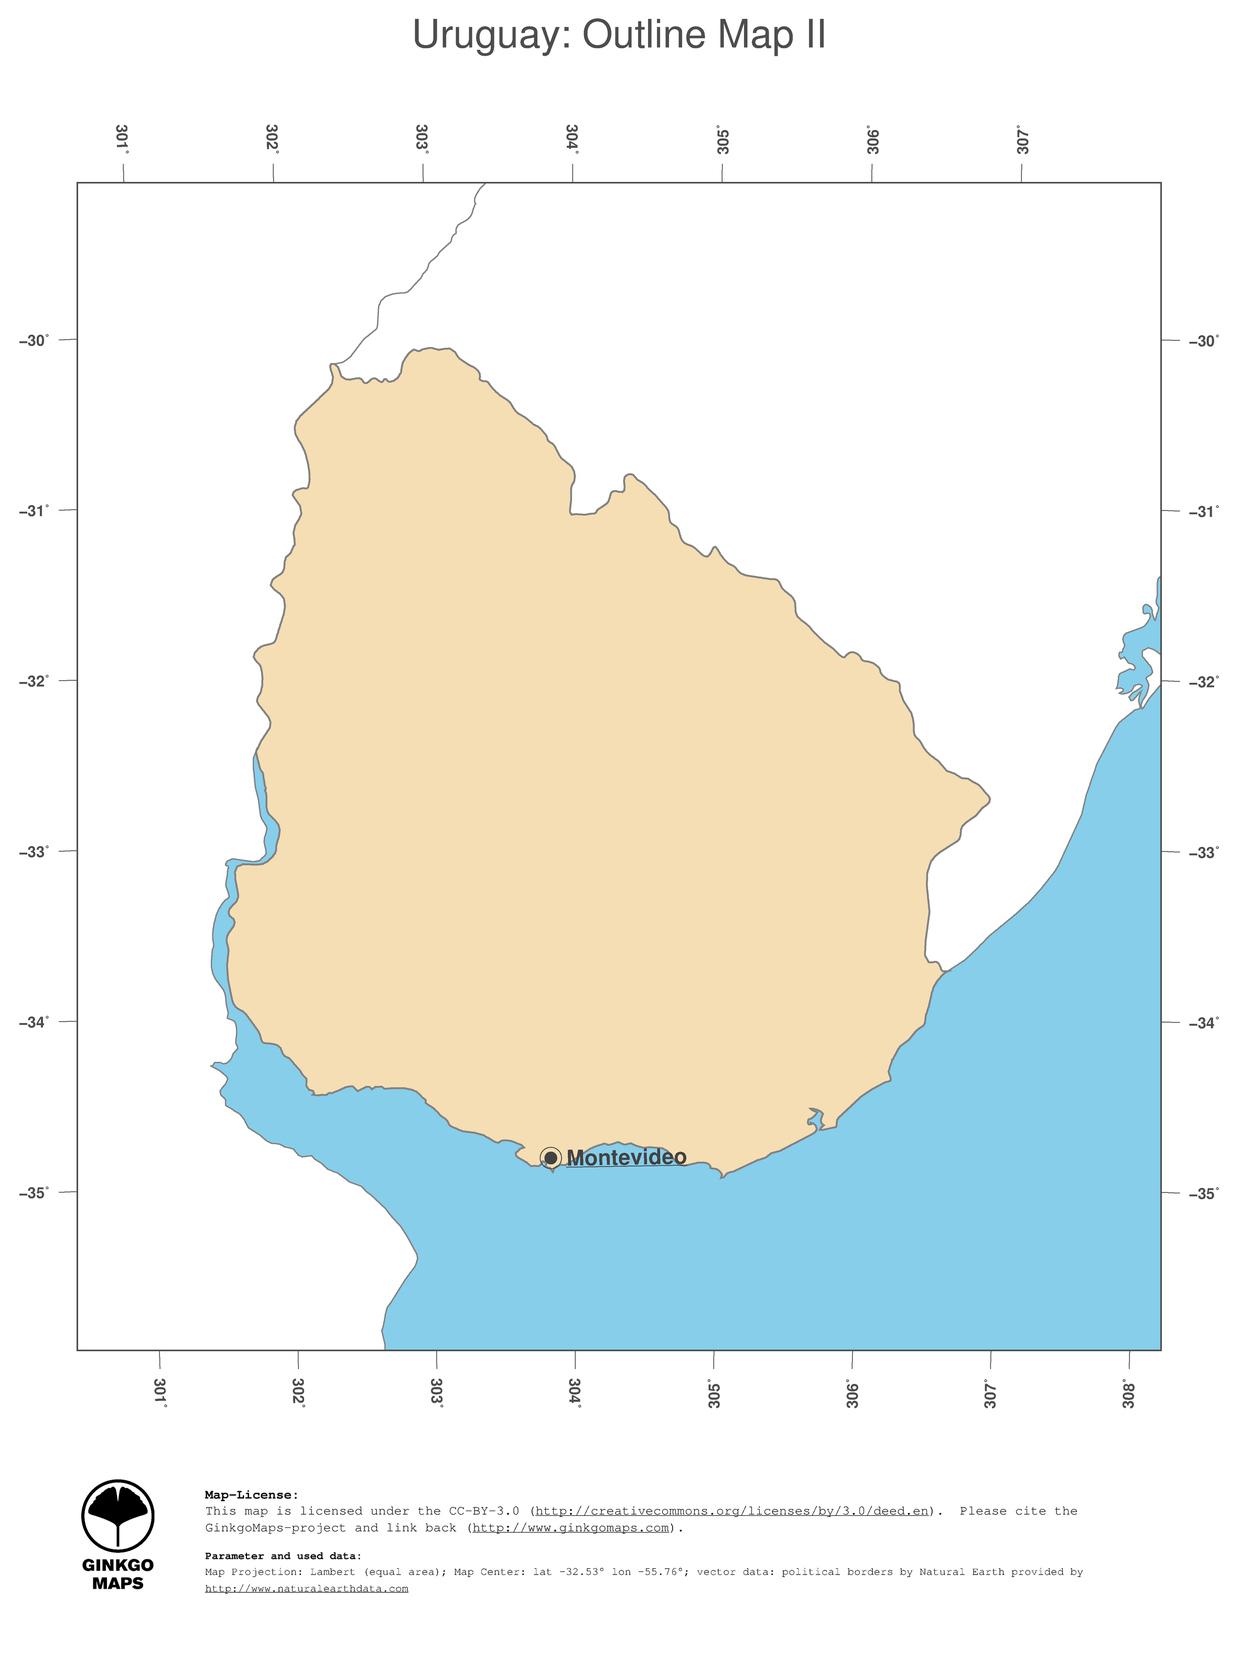 Map Uruguay GinkgoMaps continent South America region Uruguay